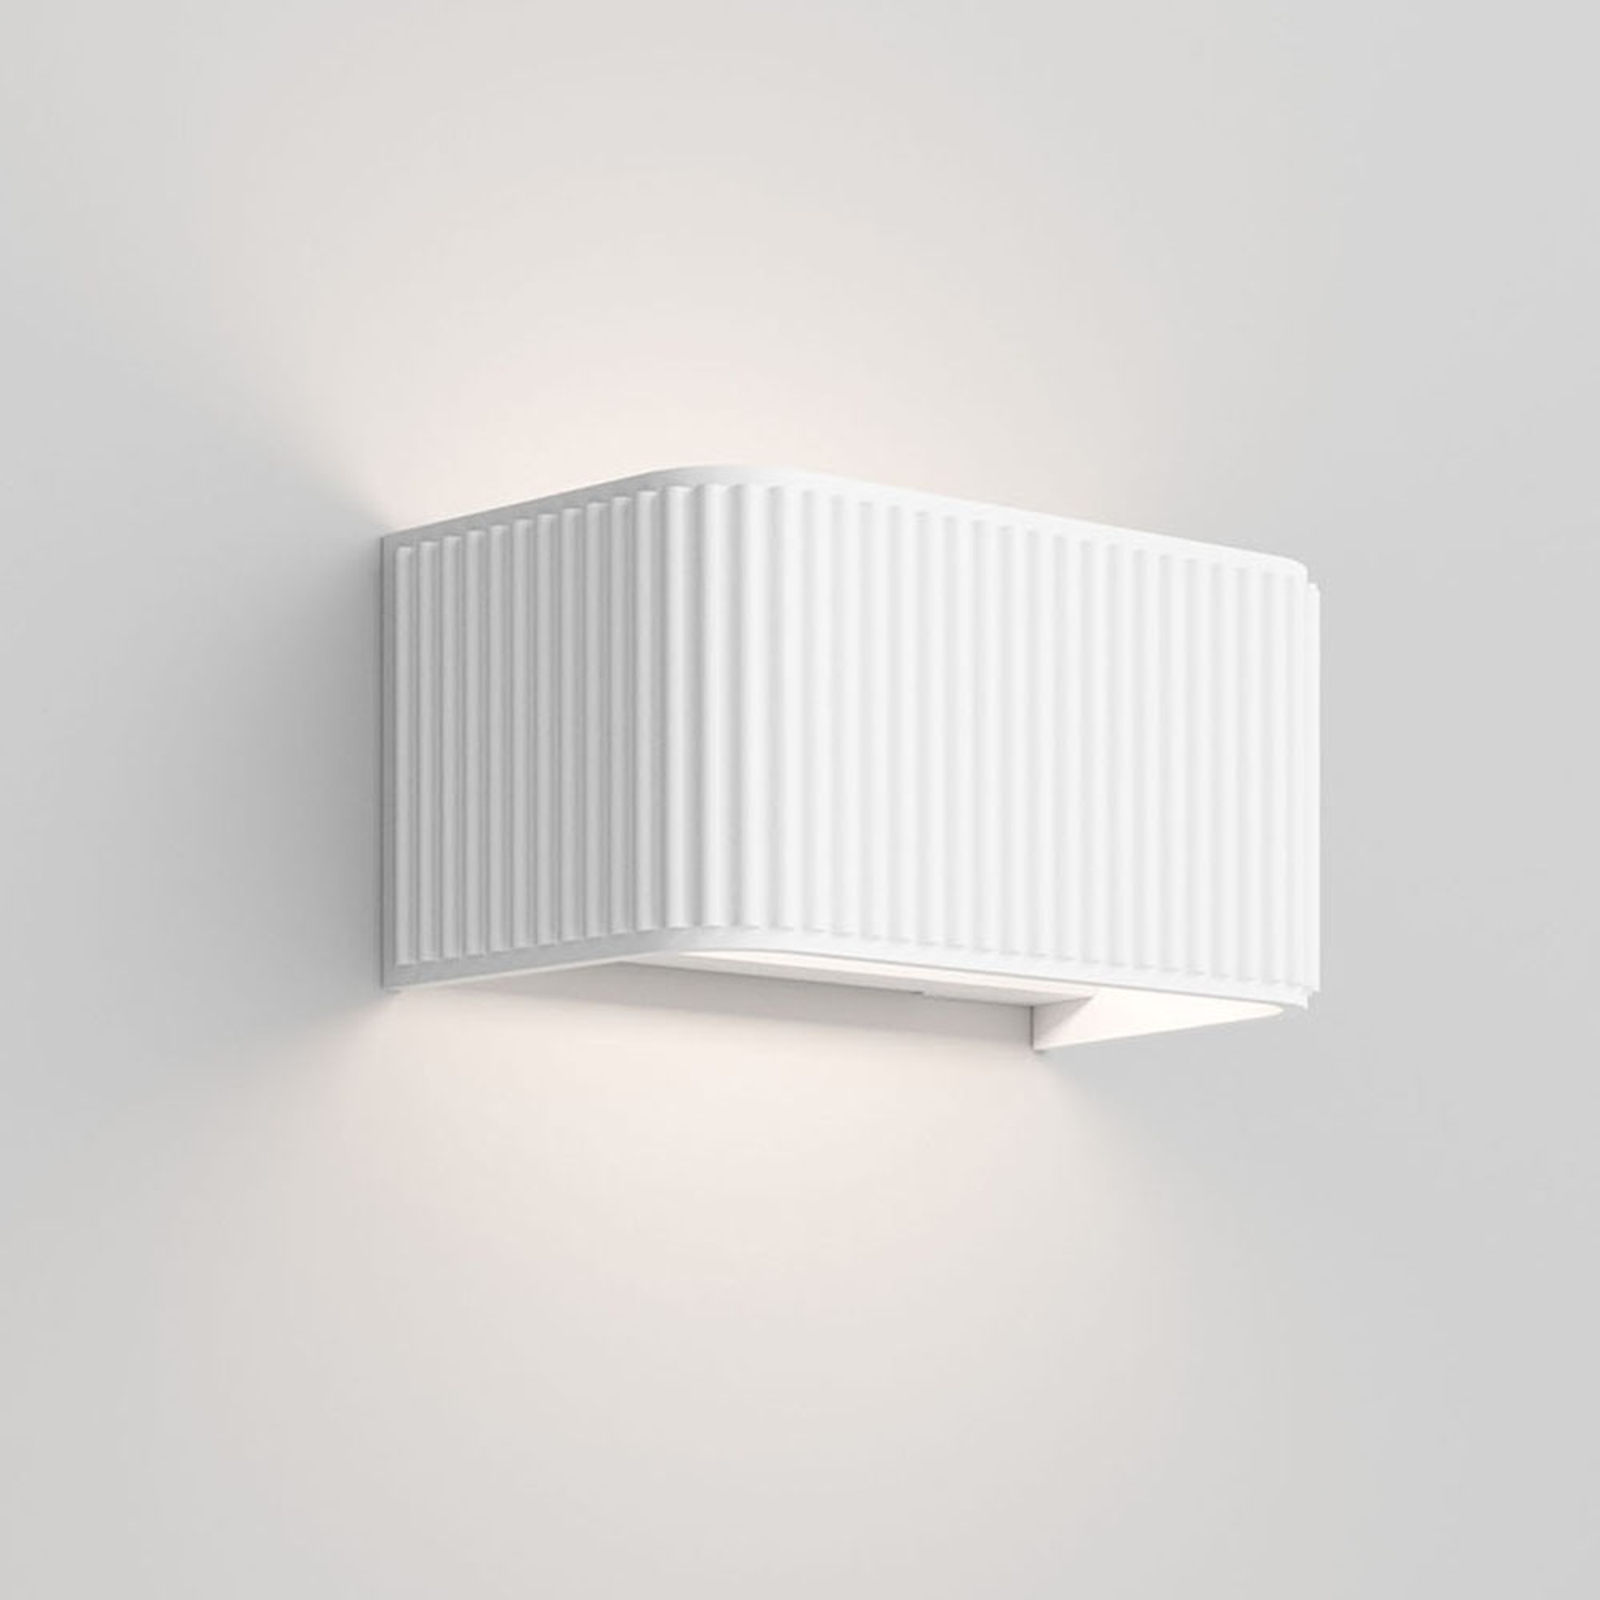 Rotaliana Dresscode W1 LED-seinävalo valkoinen